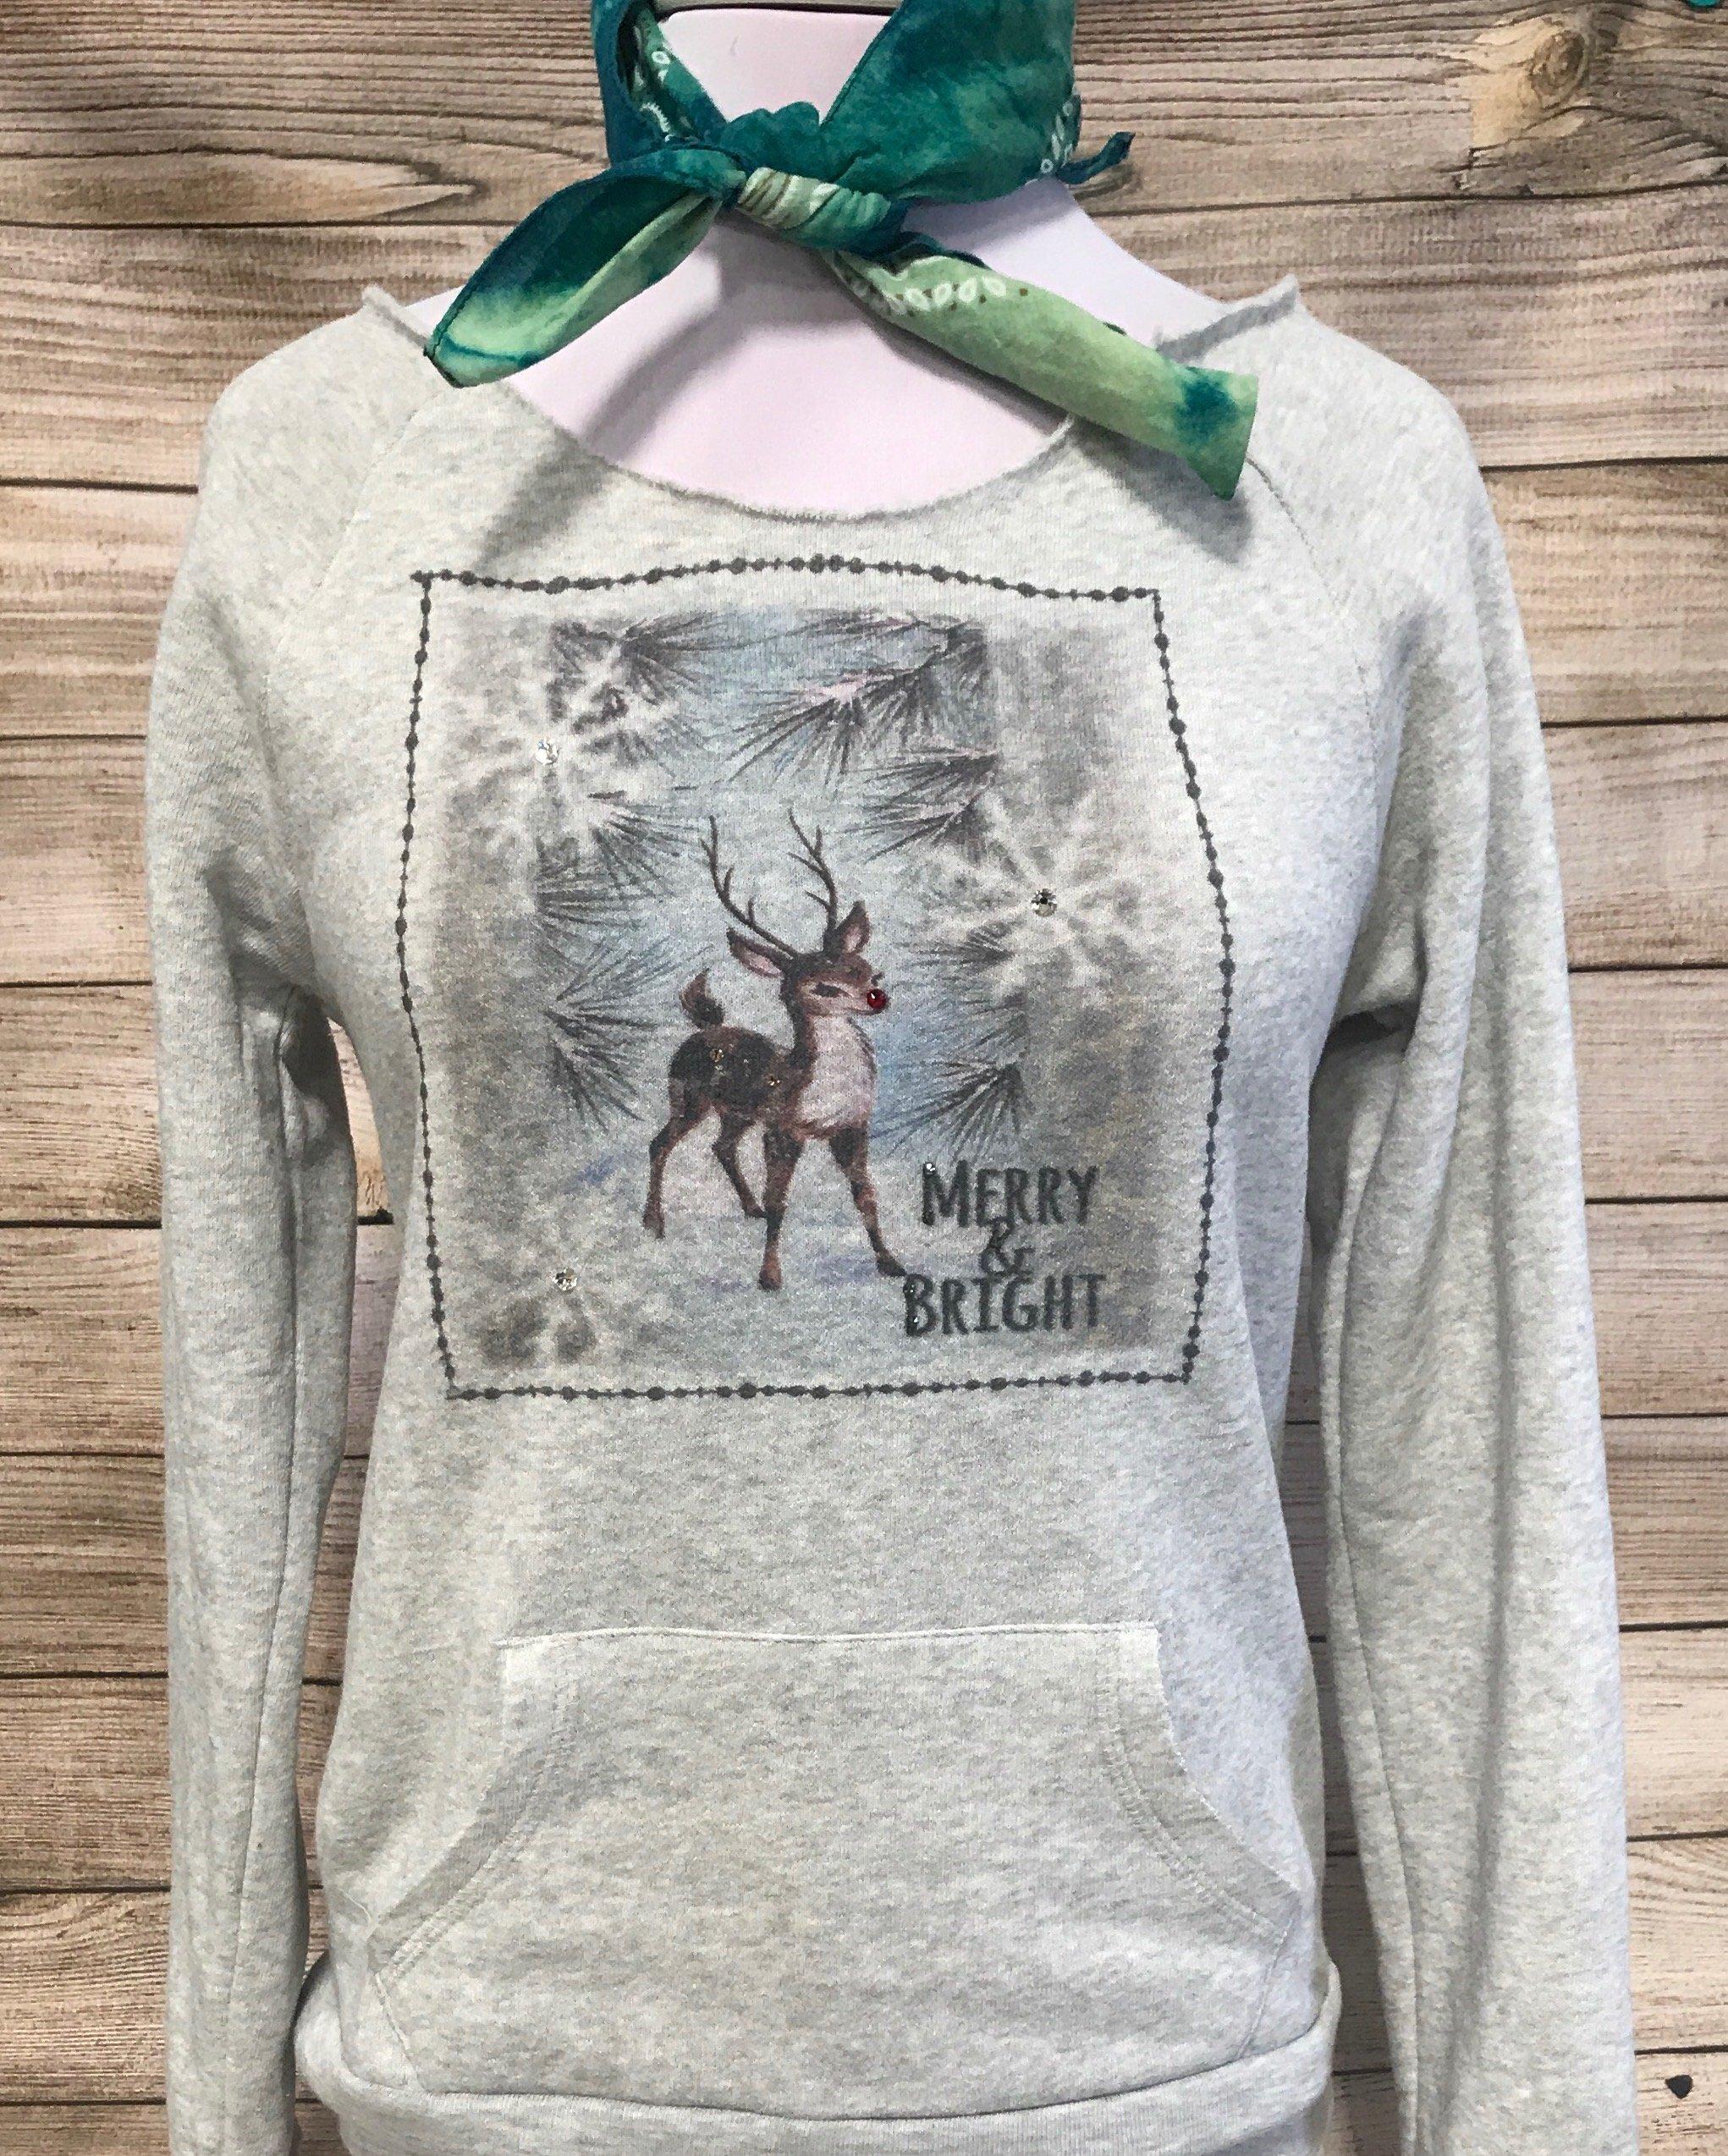 Merry & Bright Leopard Reindeer on Gray Maniac Sweater